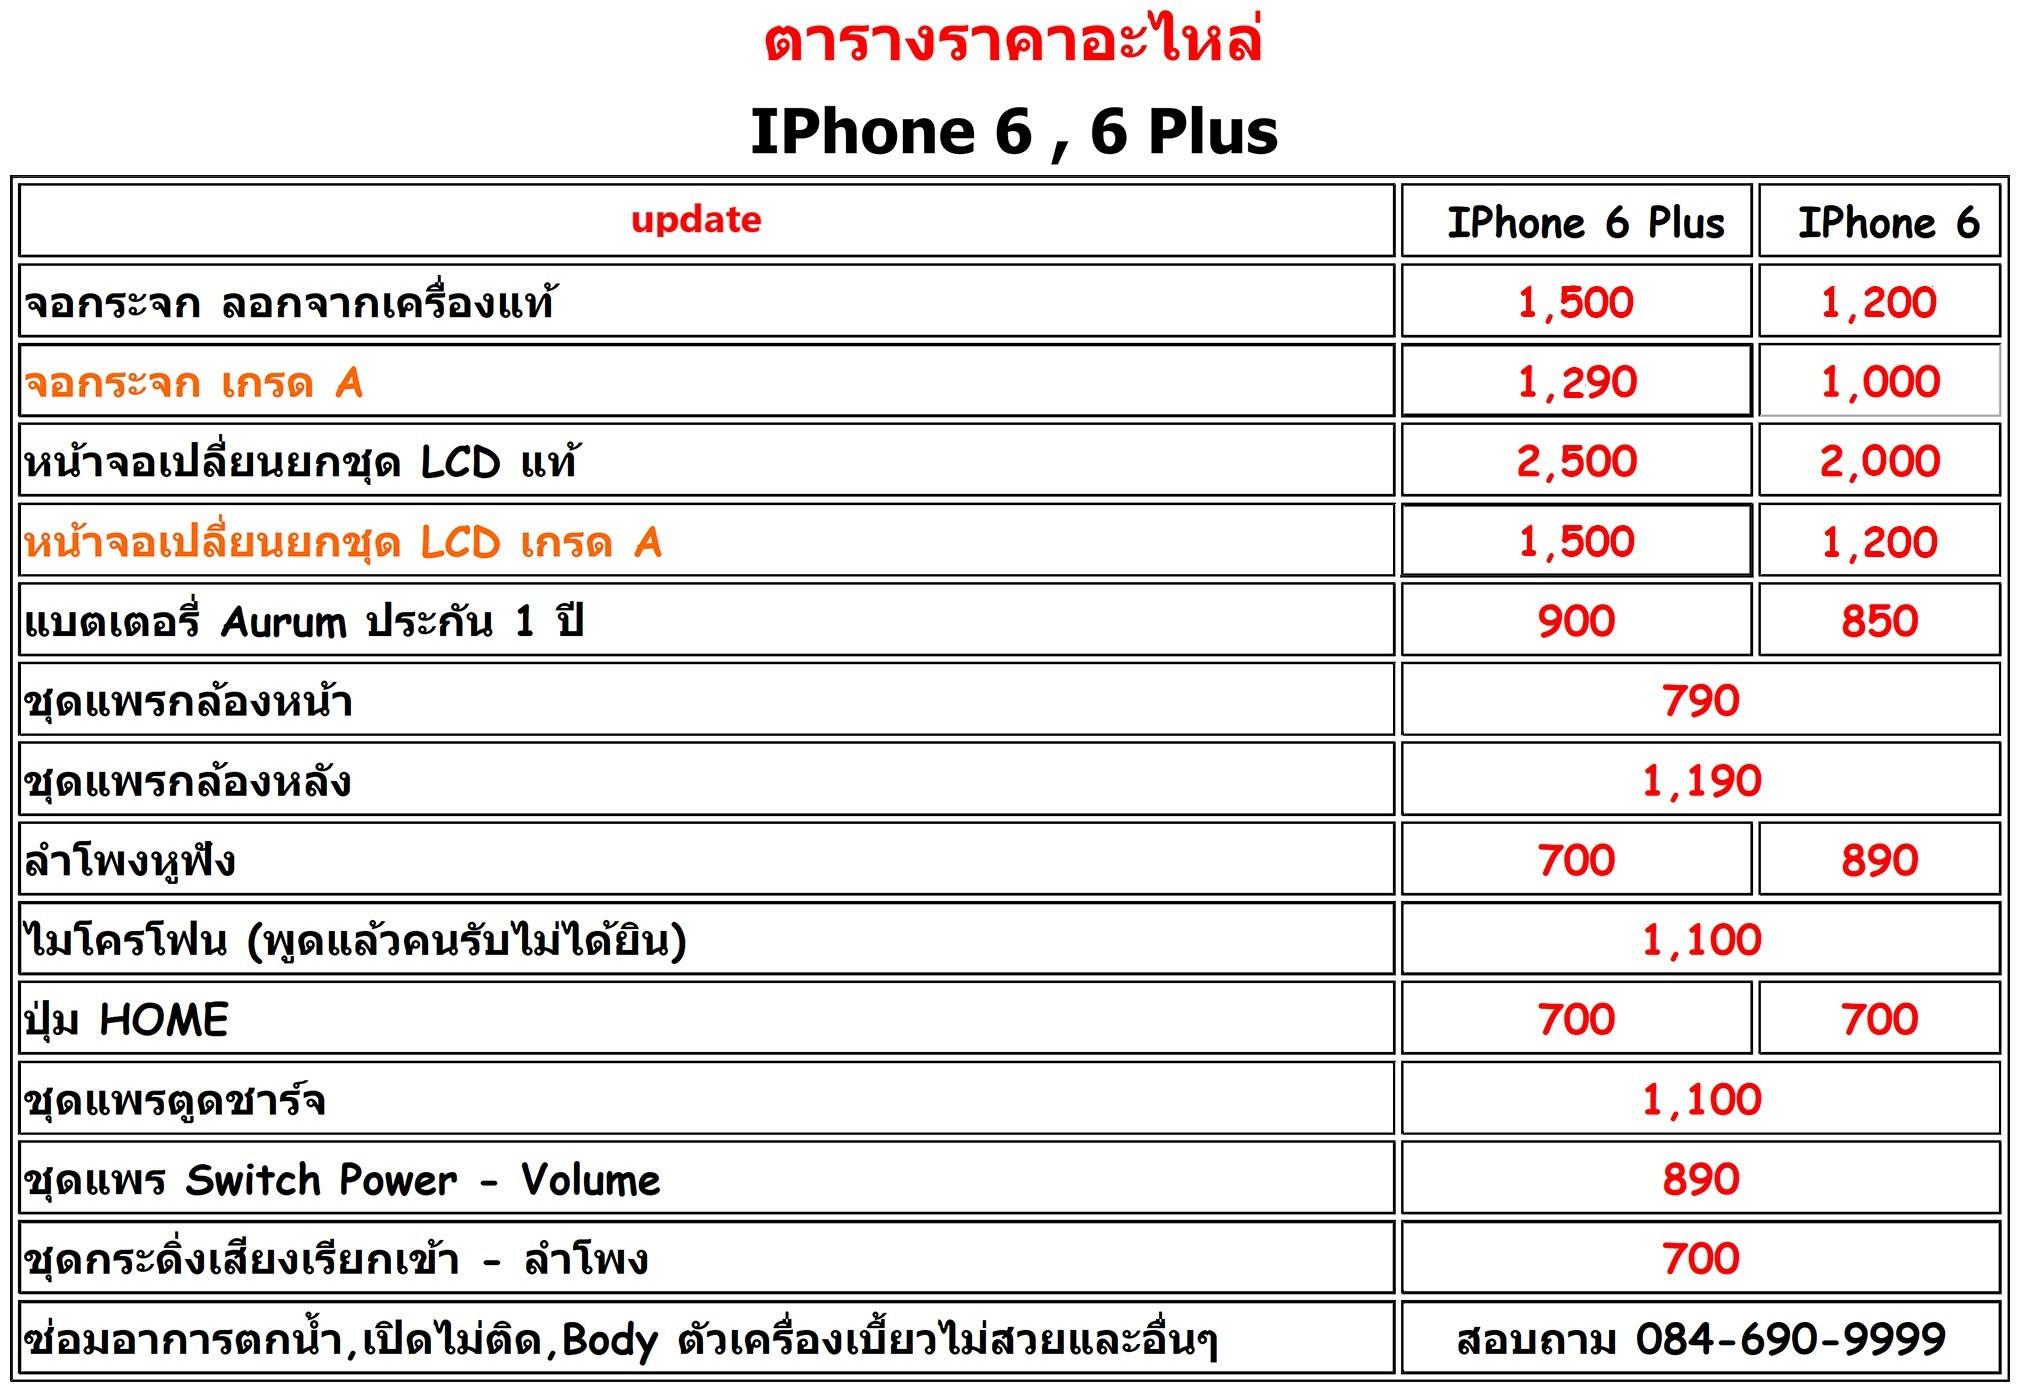 Perfectphonembk.com ซ่อมไอโฟน6 ซ่อมไอโฟน6plus เปลี่ยนจอไอโฟน6 เปลี่ยนจอไอโฟน6plus ซ่อมมือถือ ซ่อมจอมือถือ เปลี่ยนจอ ร้านขายมือถือราคาถูก ซ่อมไอโฟน ราคาซ่อมมือถือ เปลี่ยนจอไอโฟน